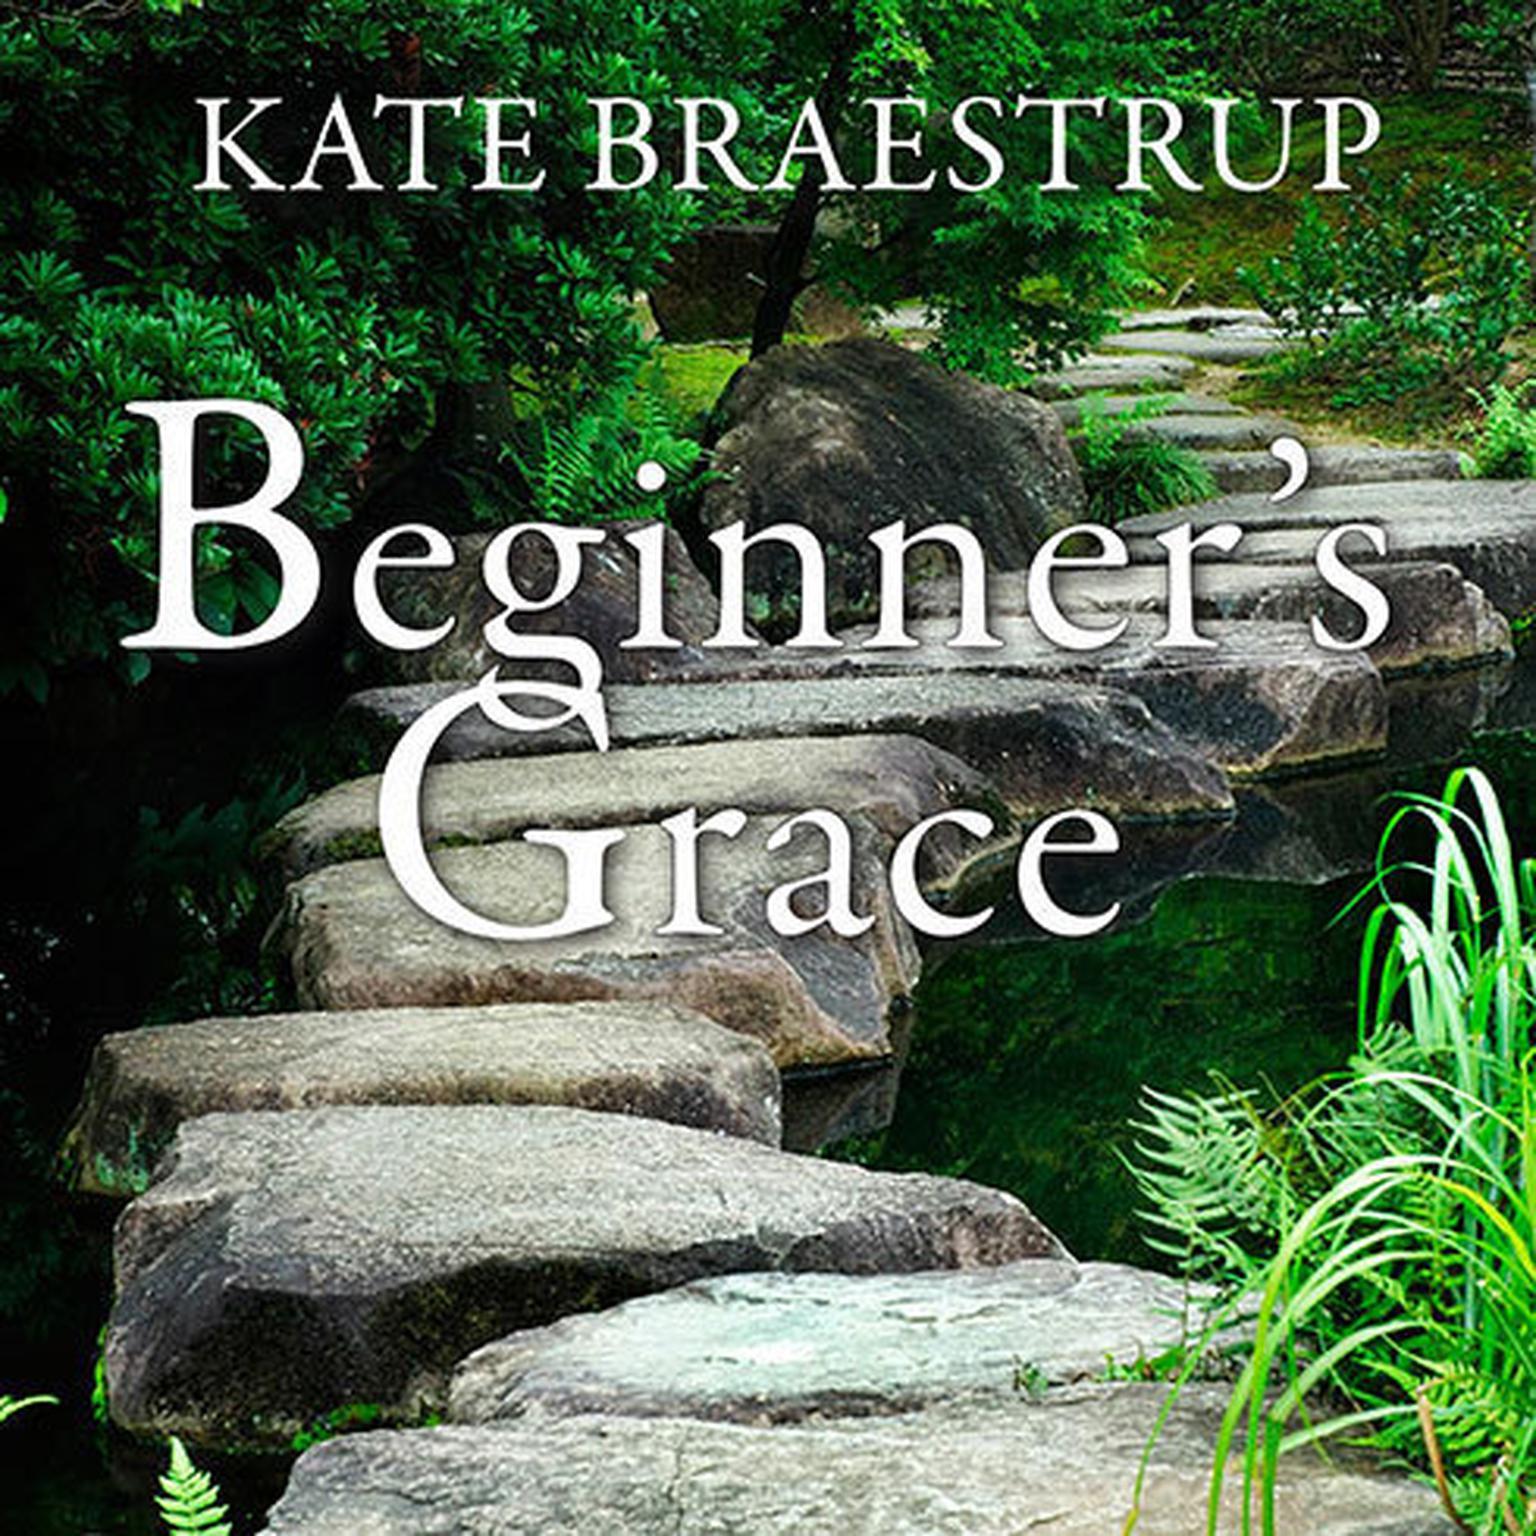 Printable Beginner's Grace: Bringing Prayer to Life Audiobook Cover Art